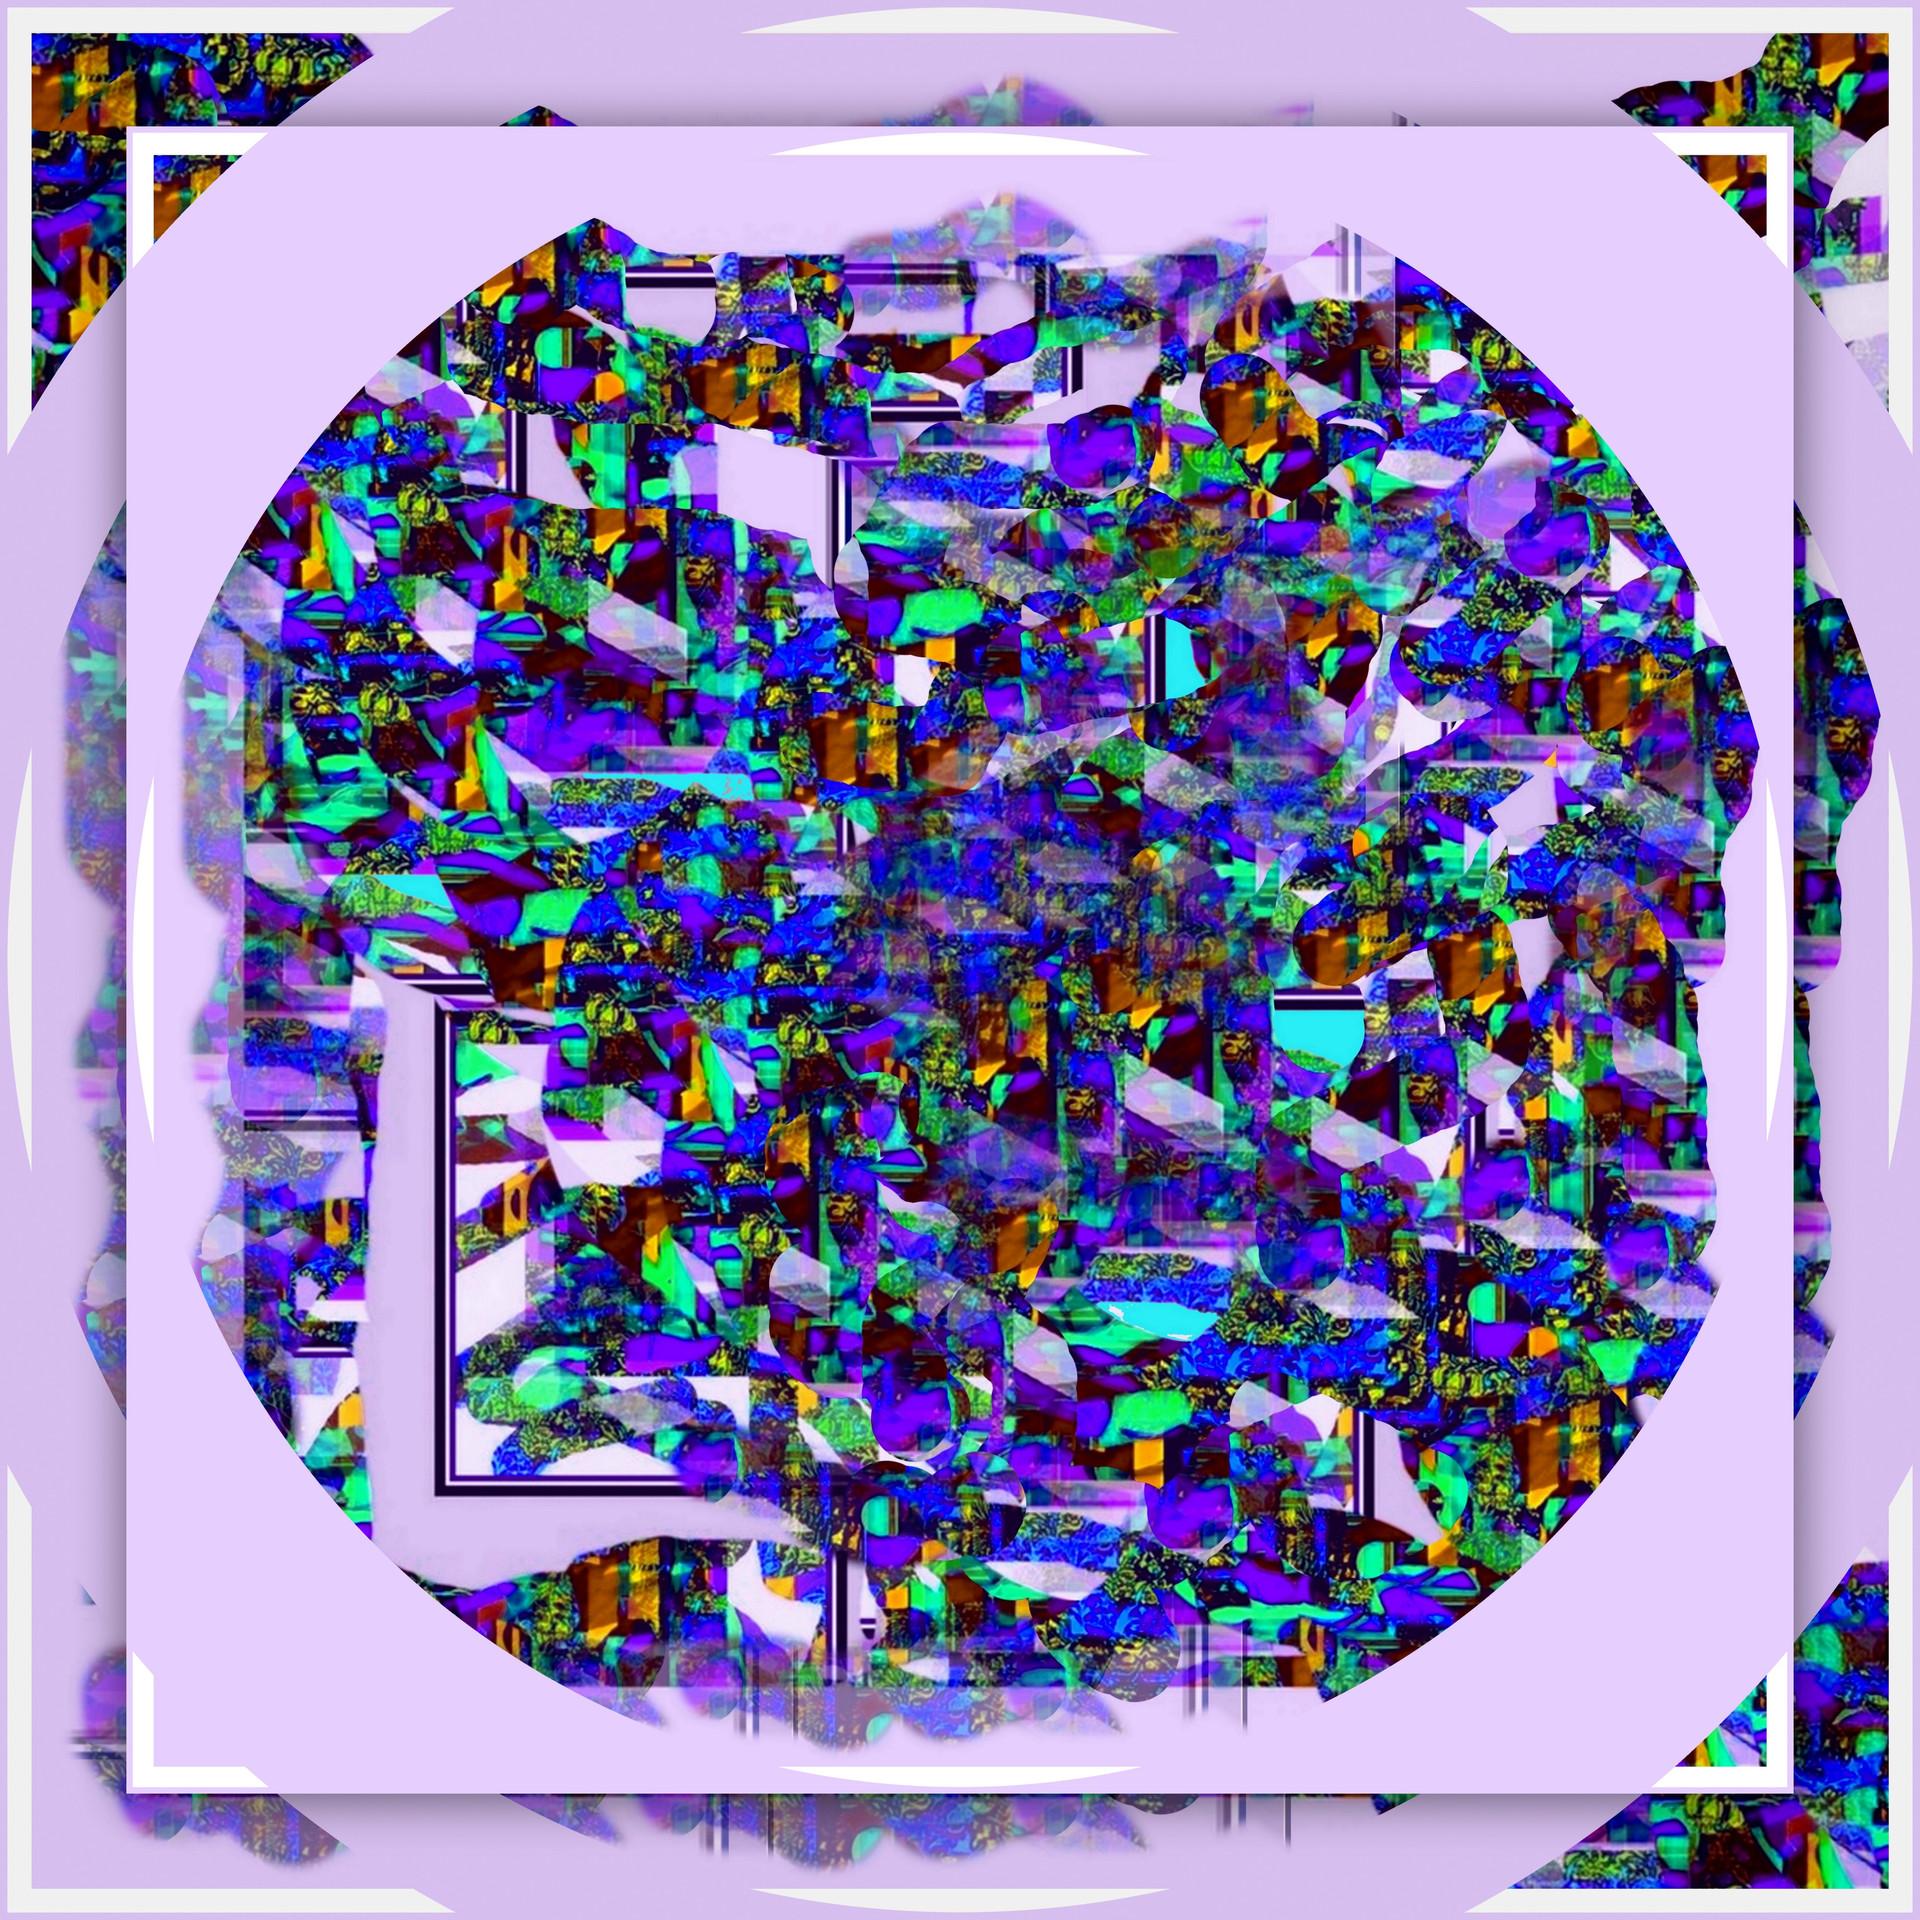 1-Collage551-001.jpg